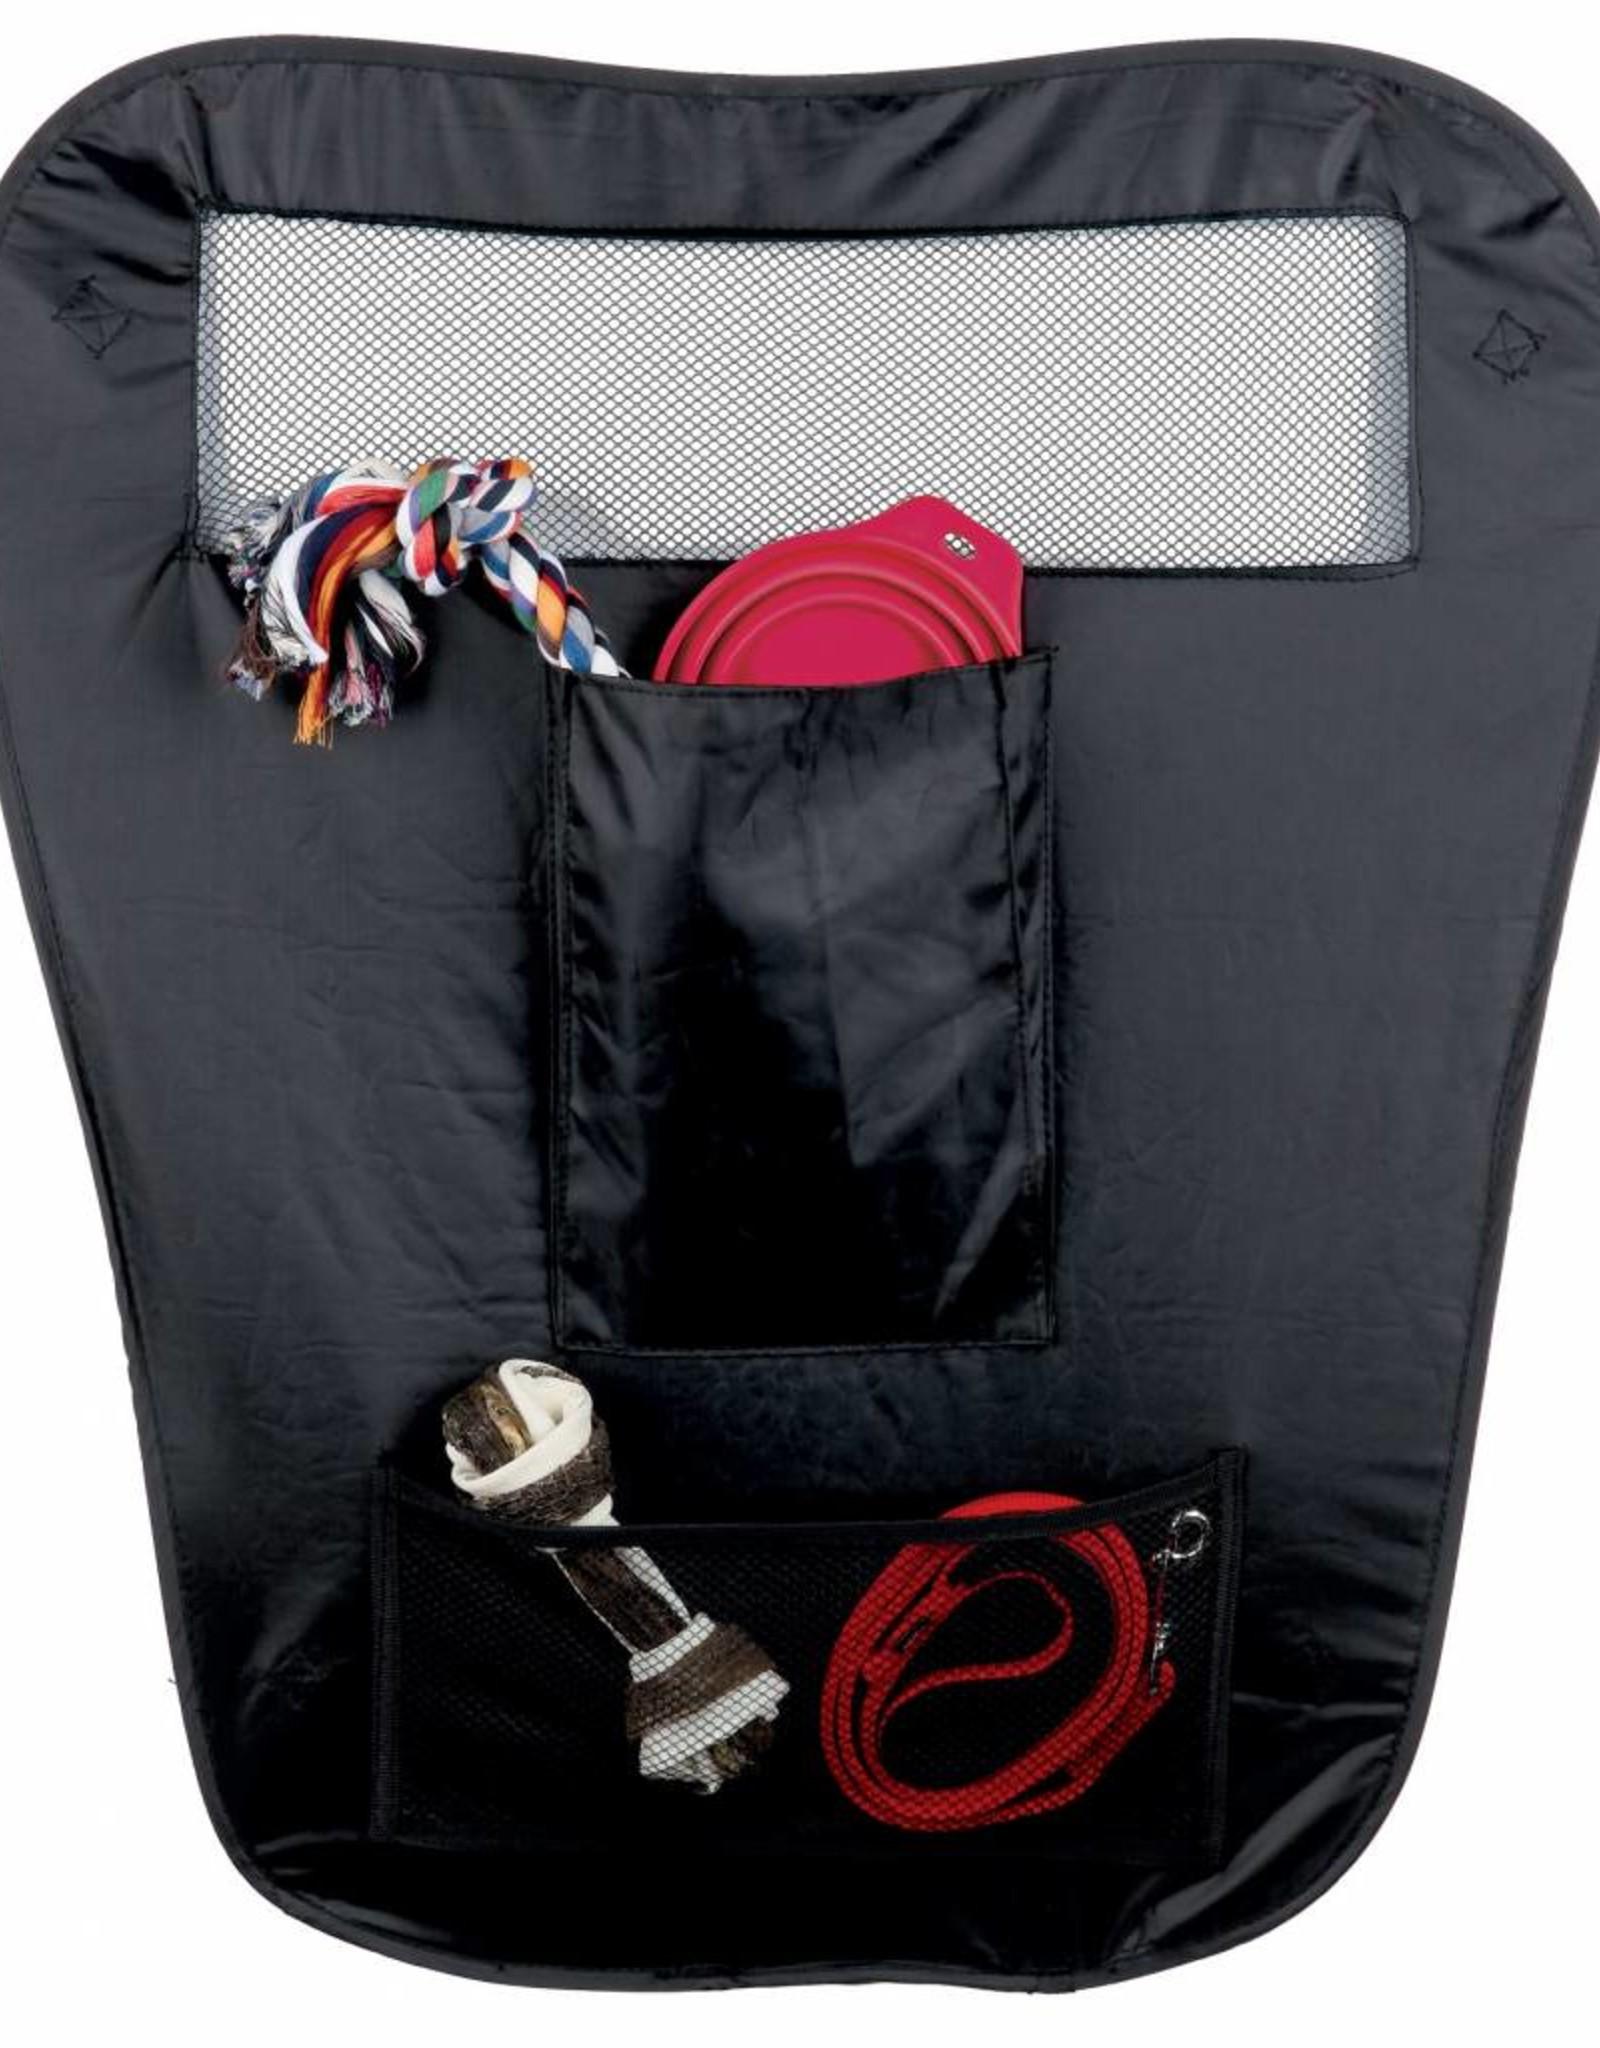 Trixie Car safety partition, foldable, nylon, 60/44 x 69 cm, black